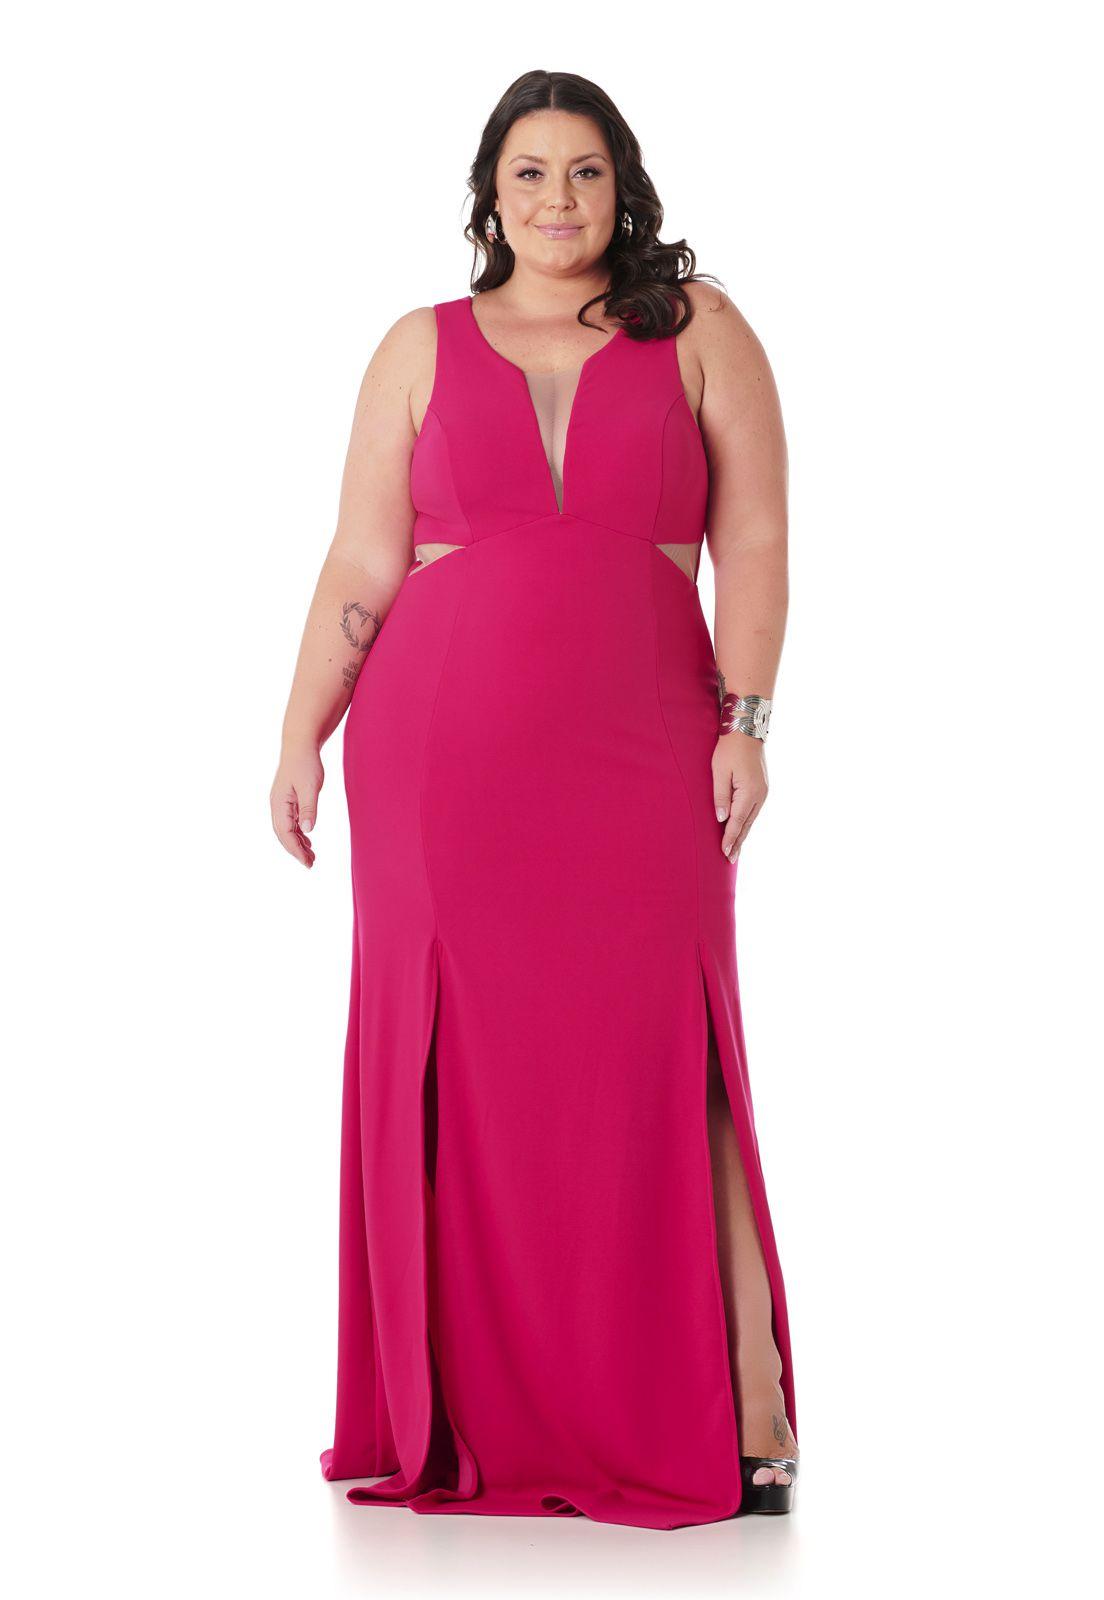 Vestido Longo Sereia Plus Size Com Fendas Pink Lala Dubi